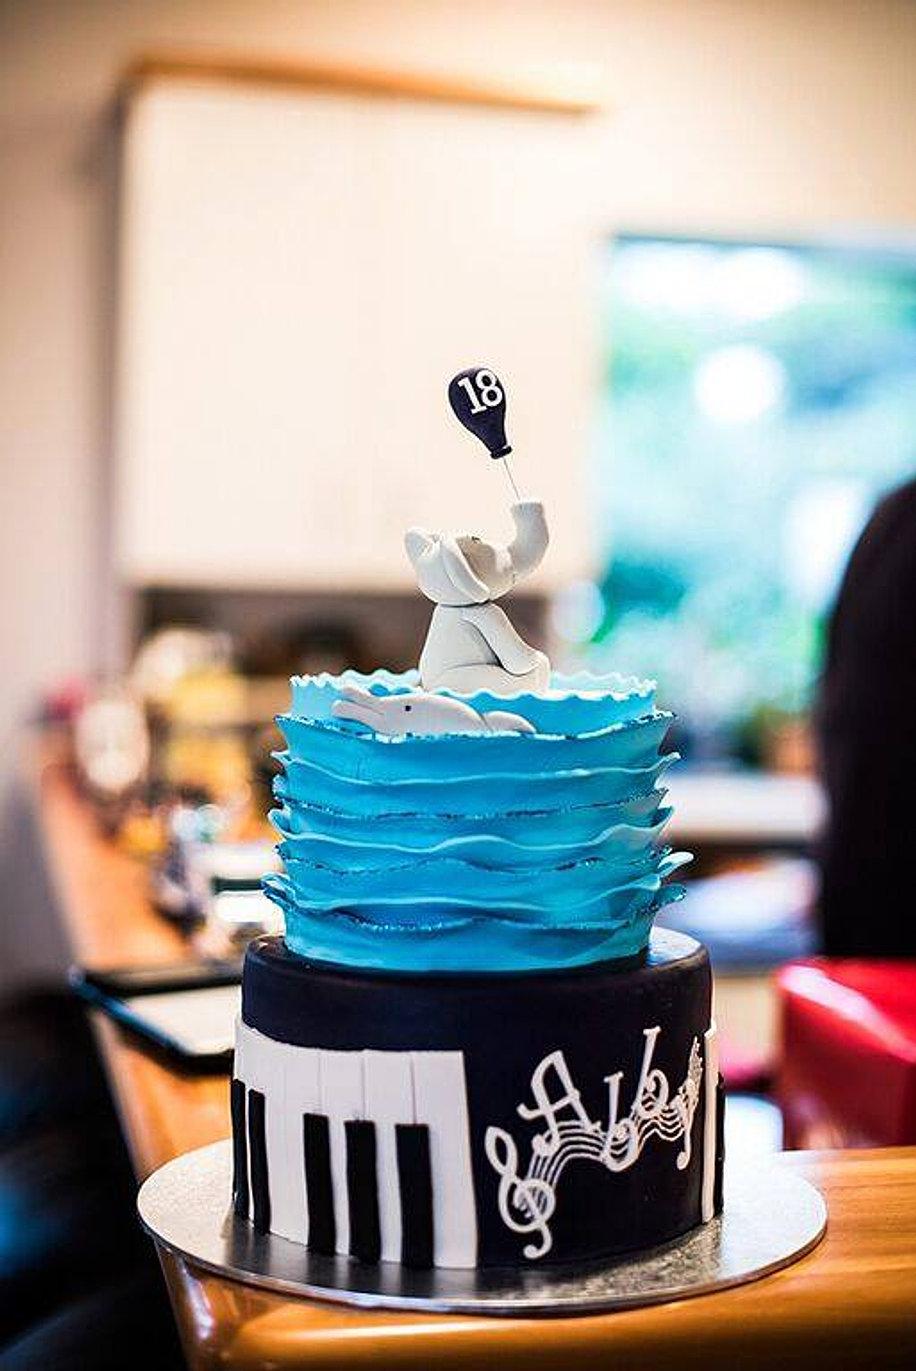 69f7ae_c21d694e5ddf46929d078252c1d00f3e_srz_916_1371_85_22_0.50_1.20_0.00_jpg_srz birthday cakes northland nz 6 on birthday cakes northland nz